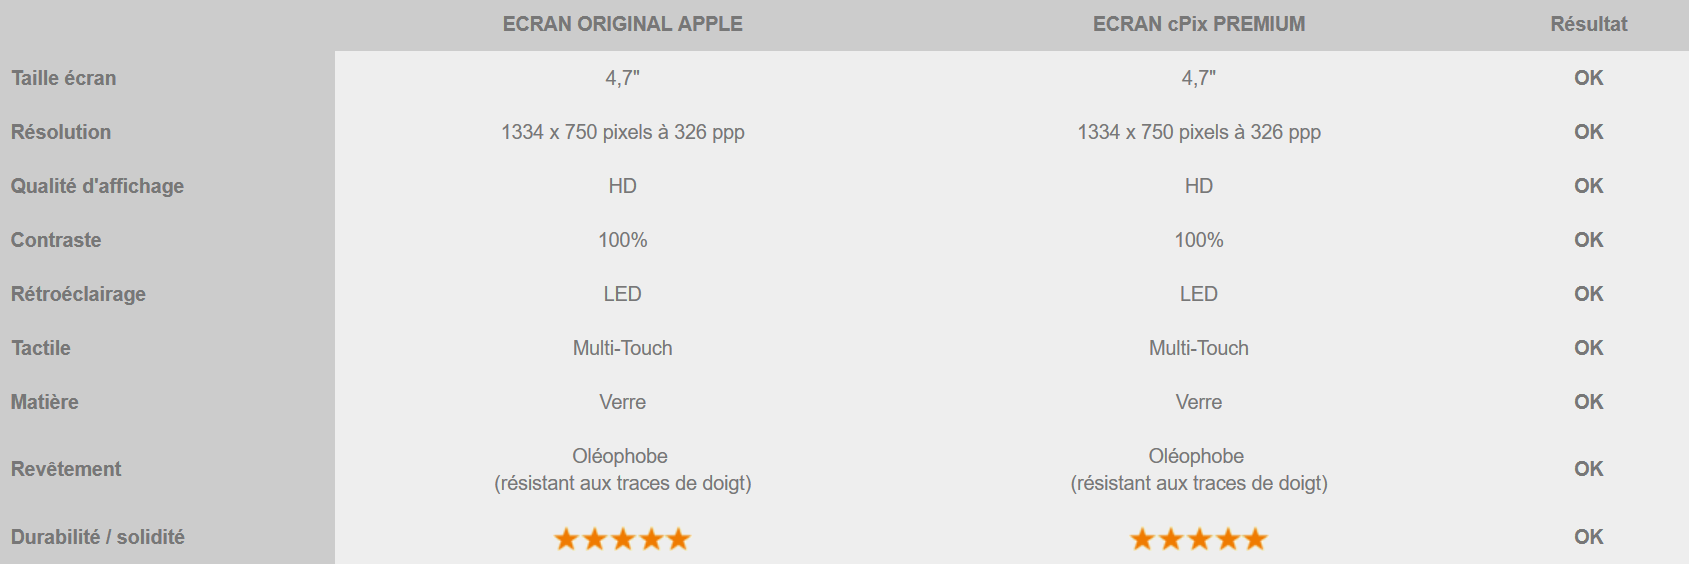 tableau comparatif ecran iphone 6 et ecran compatible